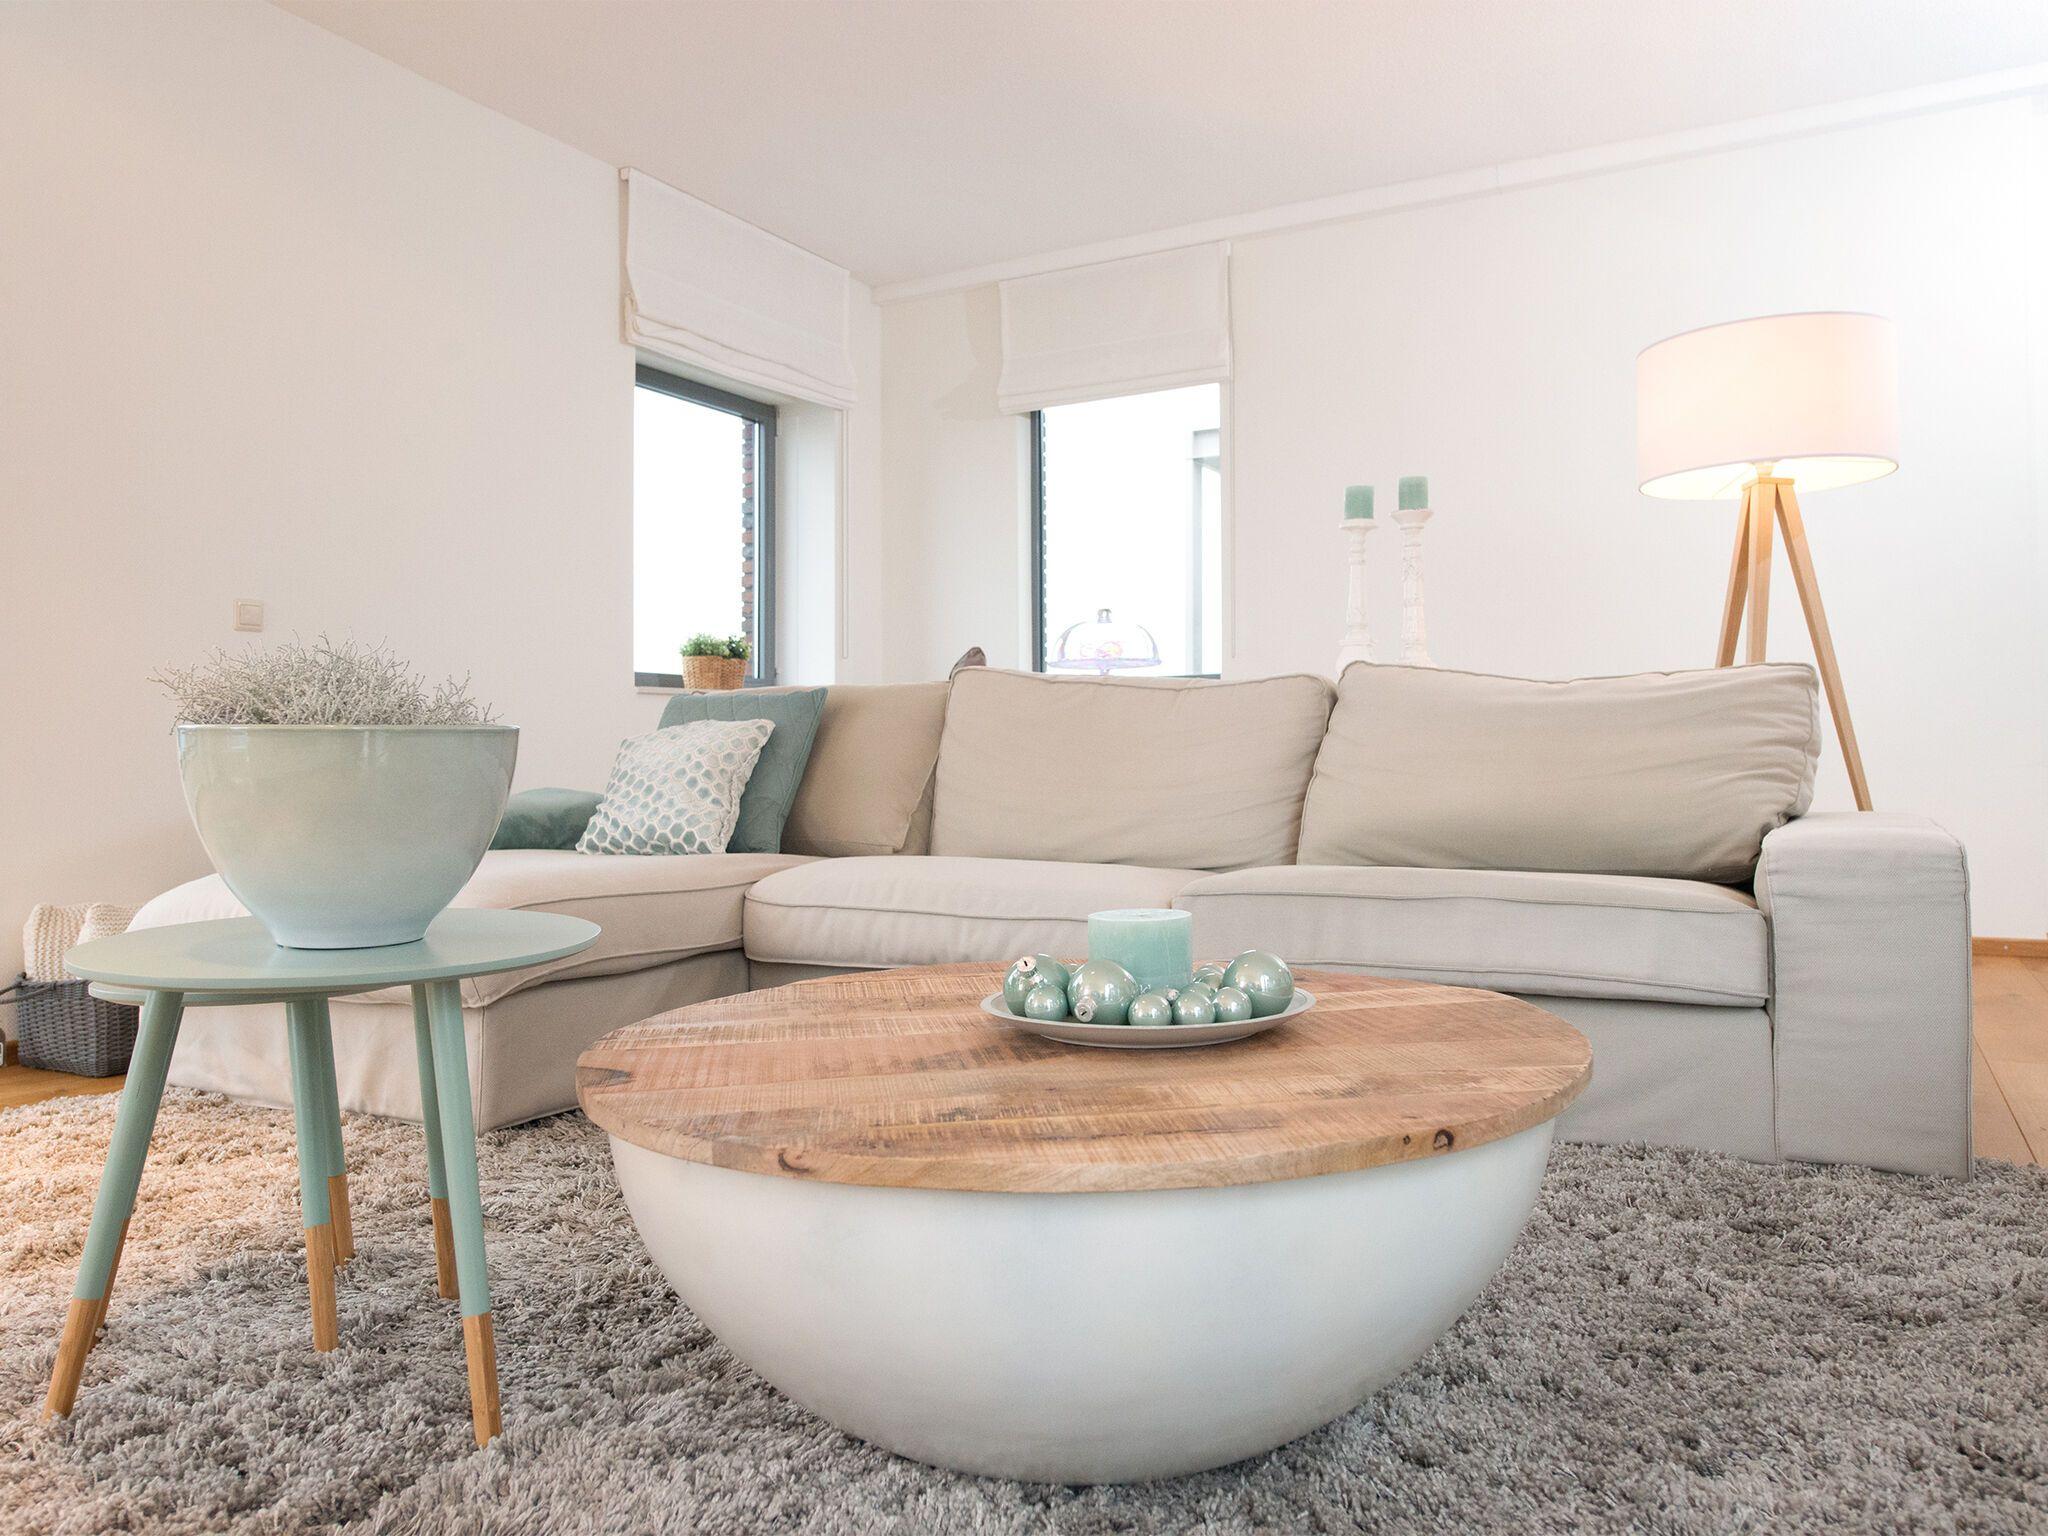 appartement laura den haag noordzeekust zuid holland. Black Bedroom Furniture Sets. Home Design Ideas